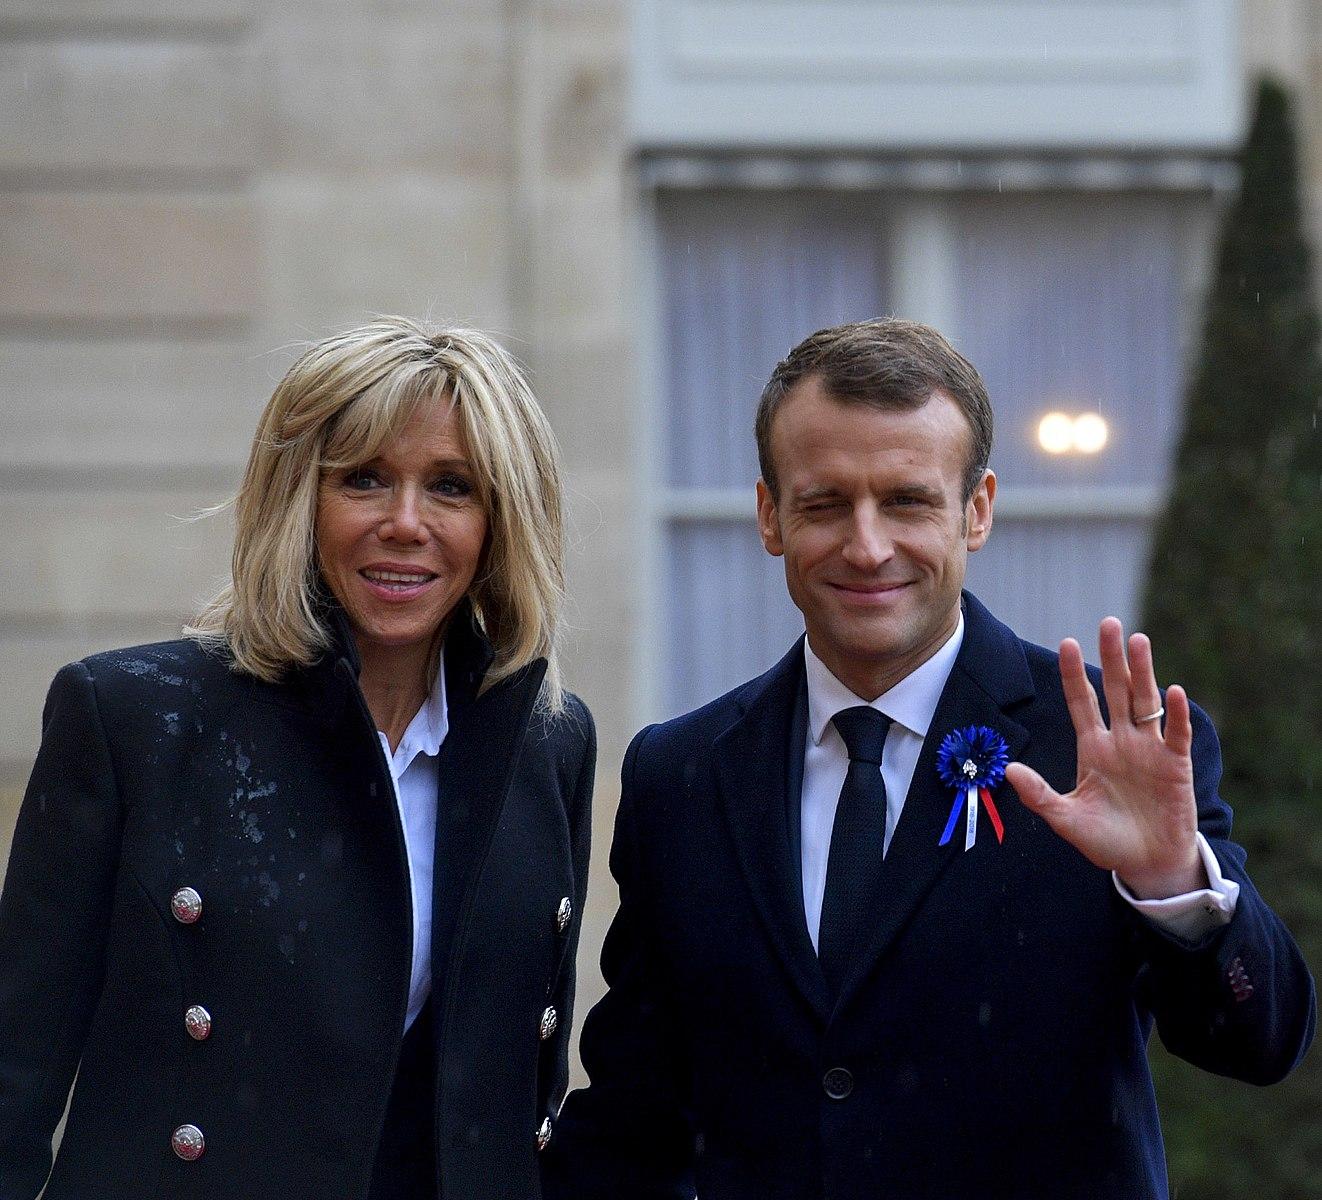 https://commons.wikimedia.org/wiki/File:Brigitte_Macron_and_Emmanuel_Macron_-_November_2018_(1541931666)_(cropped).jpg